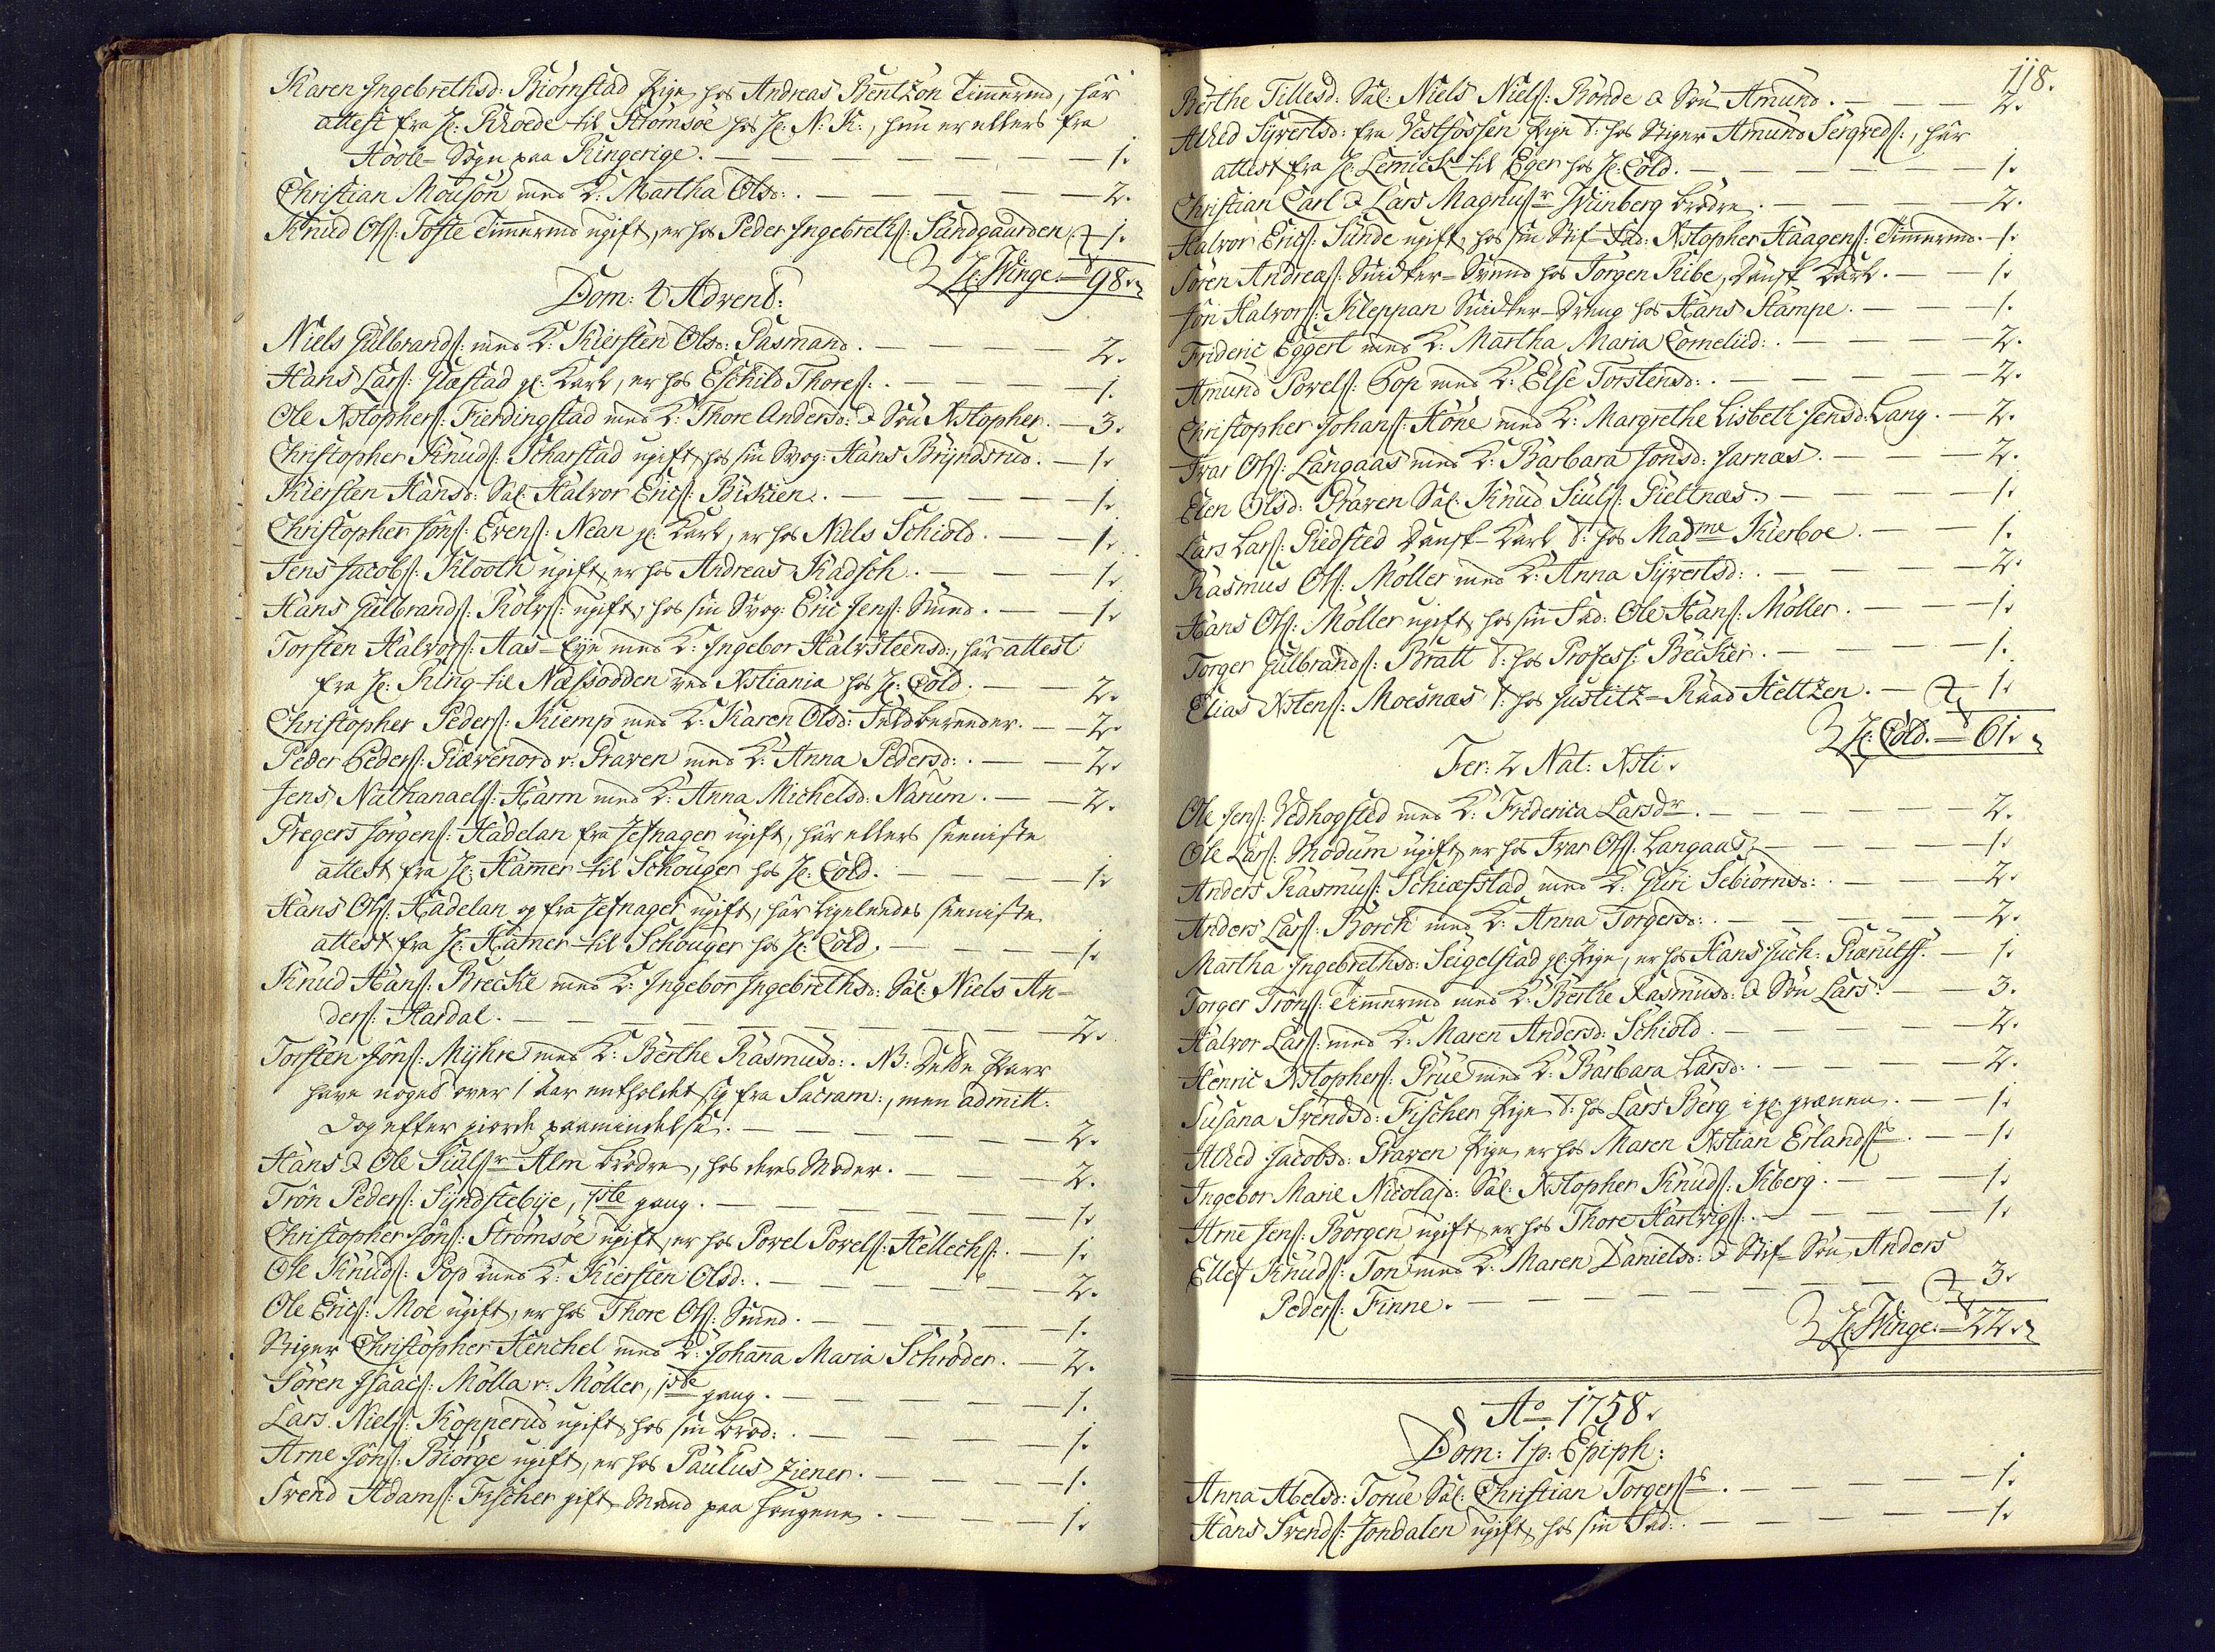 SAKO, Kongsberg kirkebøker, M/Ma/L0005: Kommunikantprotokoll nr. 5, 1755-1761, s. 118